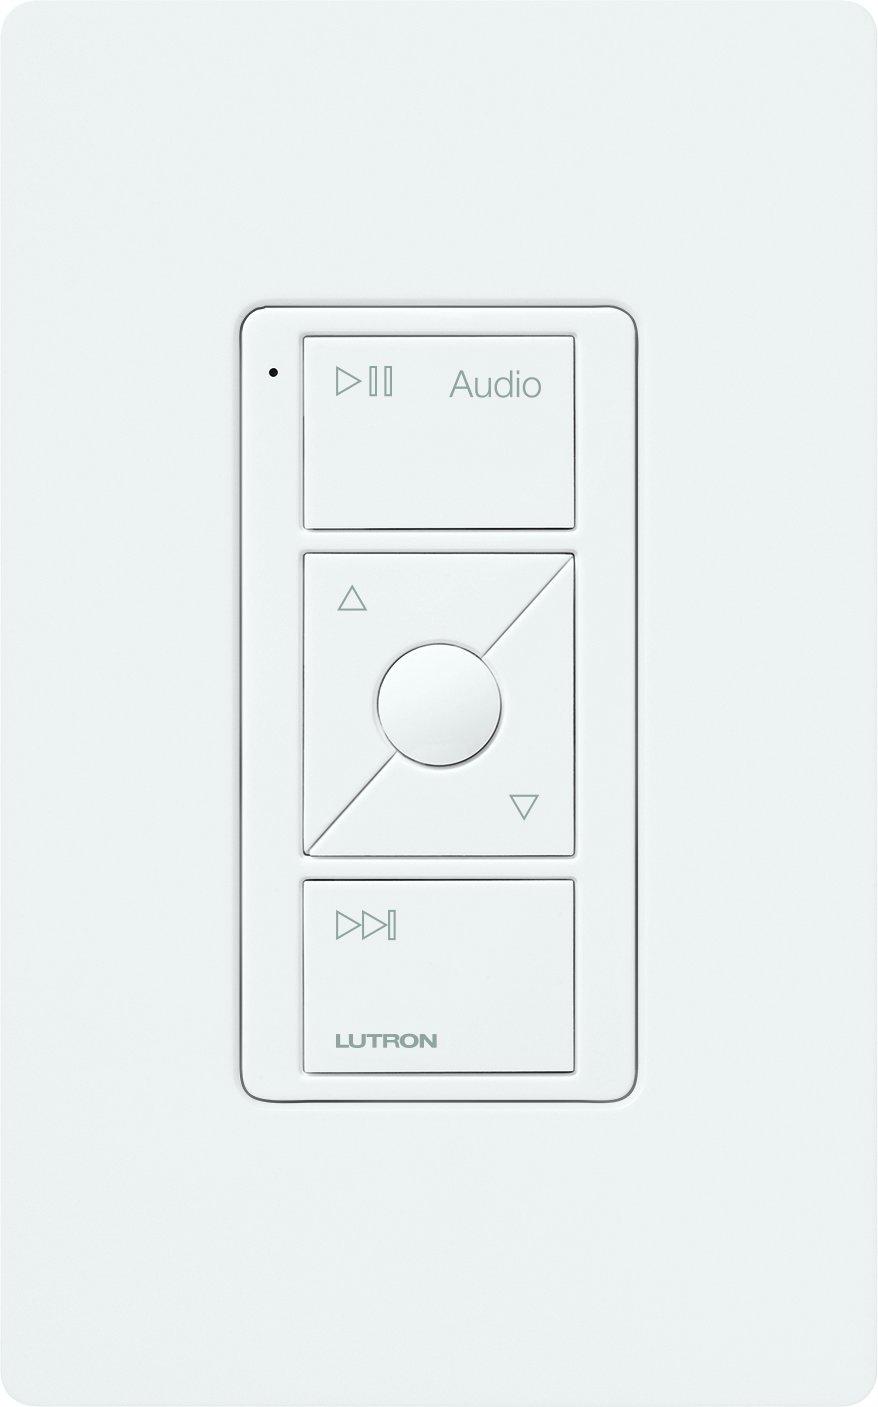 Lutron Caseta Wireless Pico Remote for Audio, Works with Sonos, PJ2-3BRL-GWH-A02, White by Lutron (Image #3)